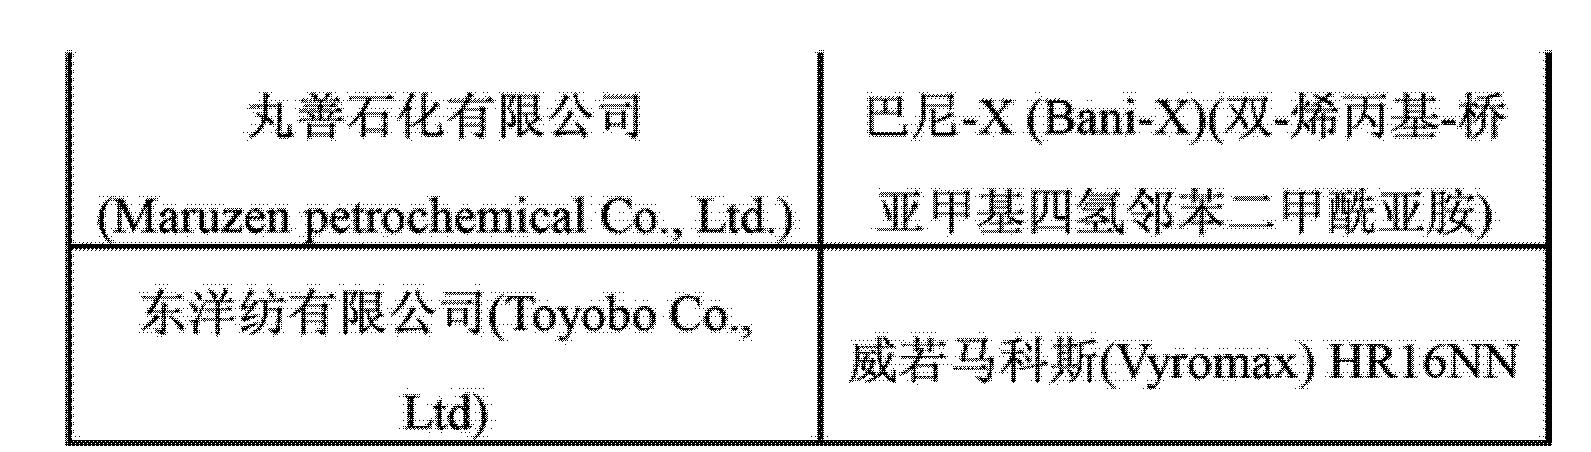 Figure CN102630355AD00111